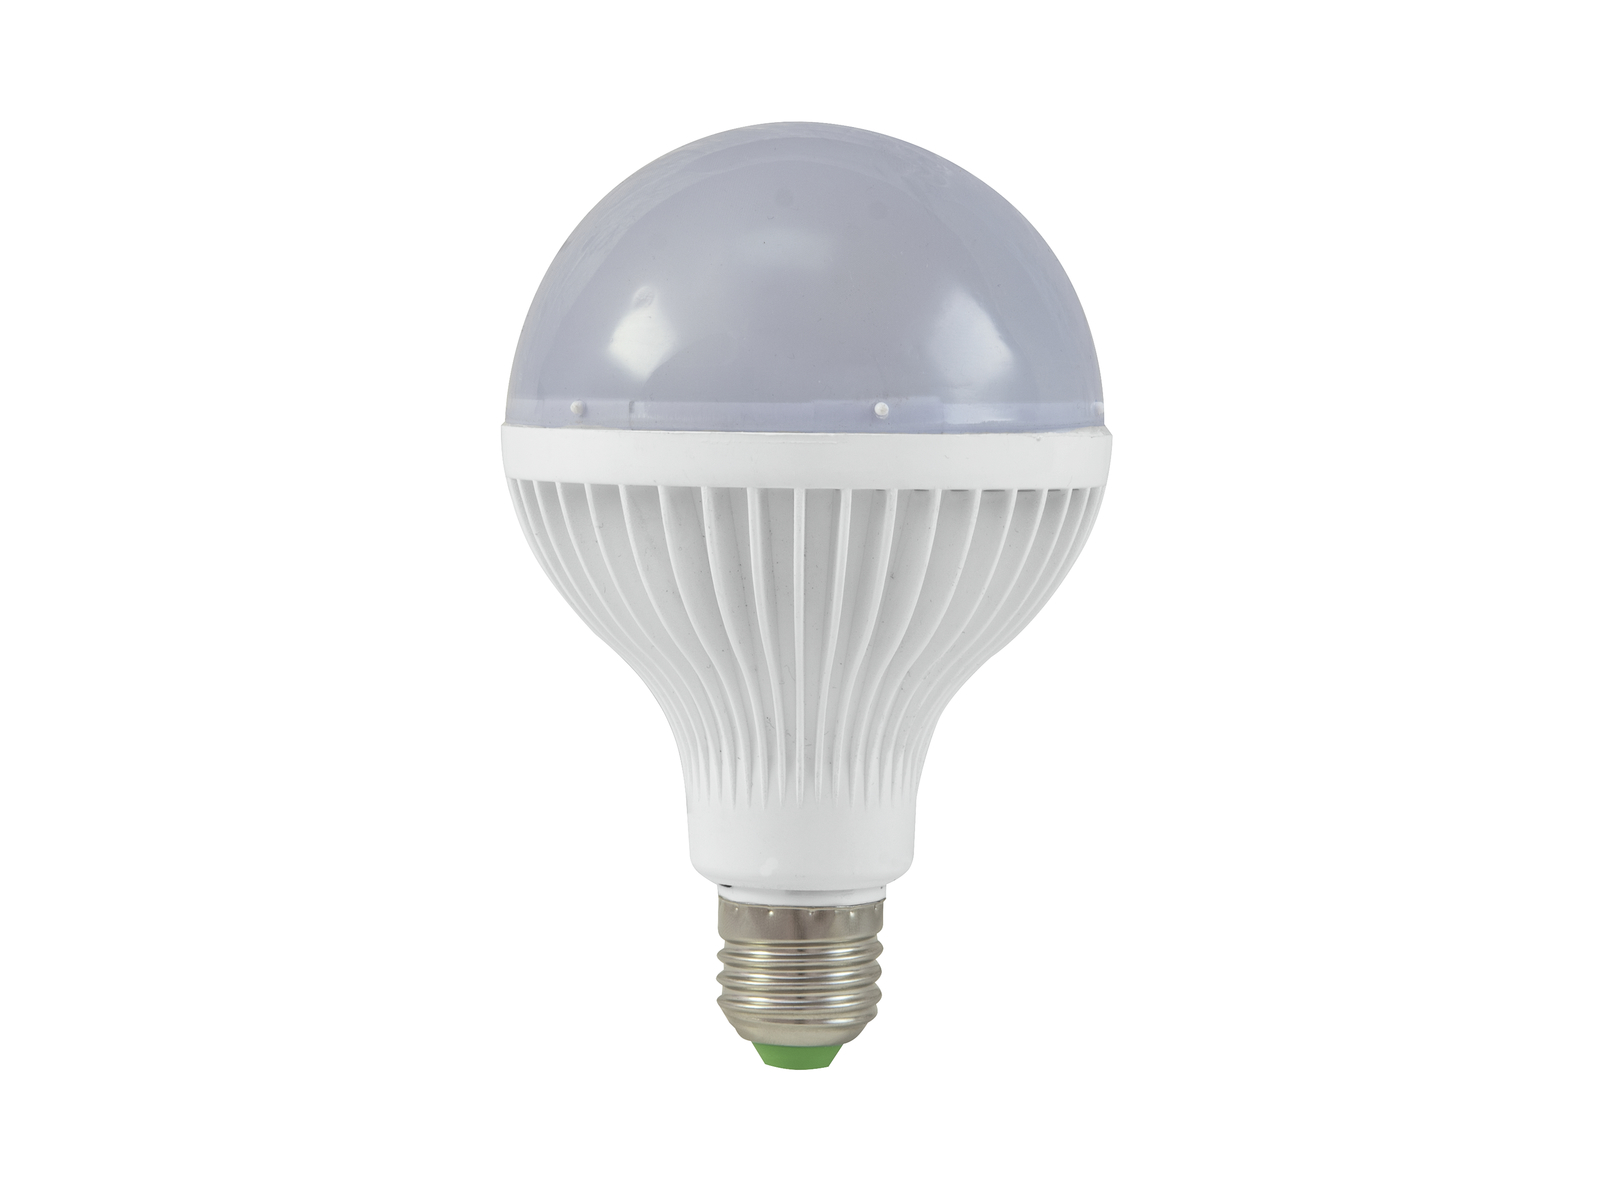 OMNILUX LED GM-10-27 Grazioso Fiore